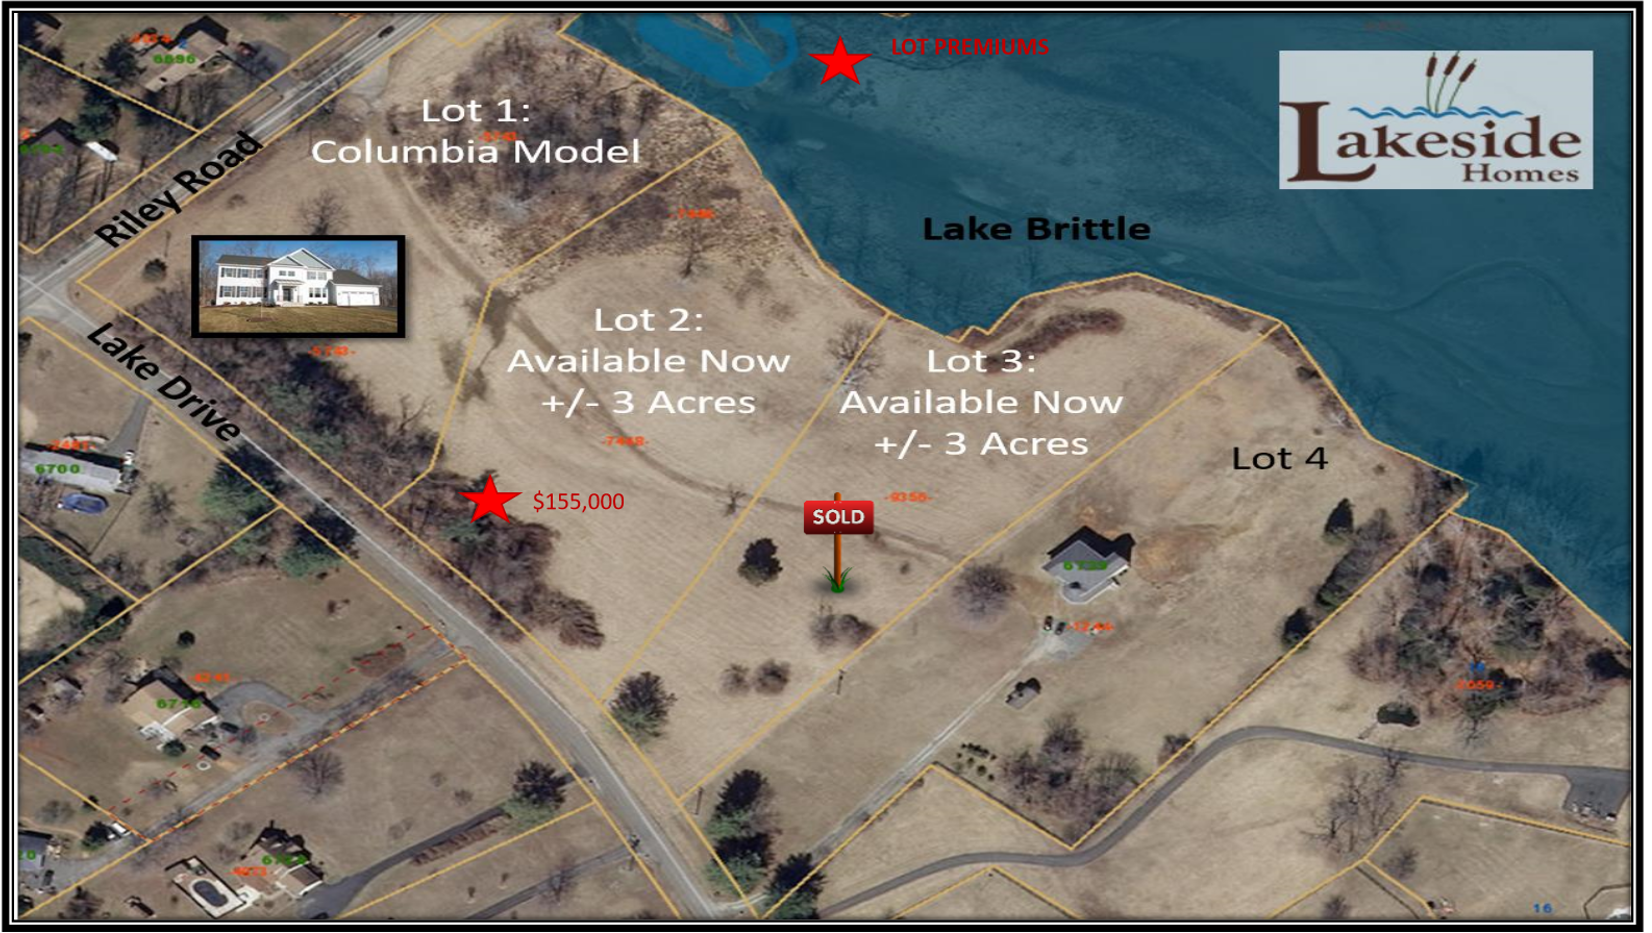 lake brittle image